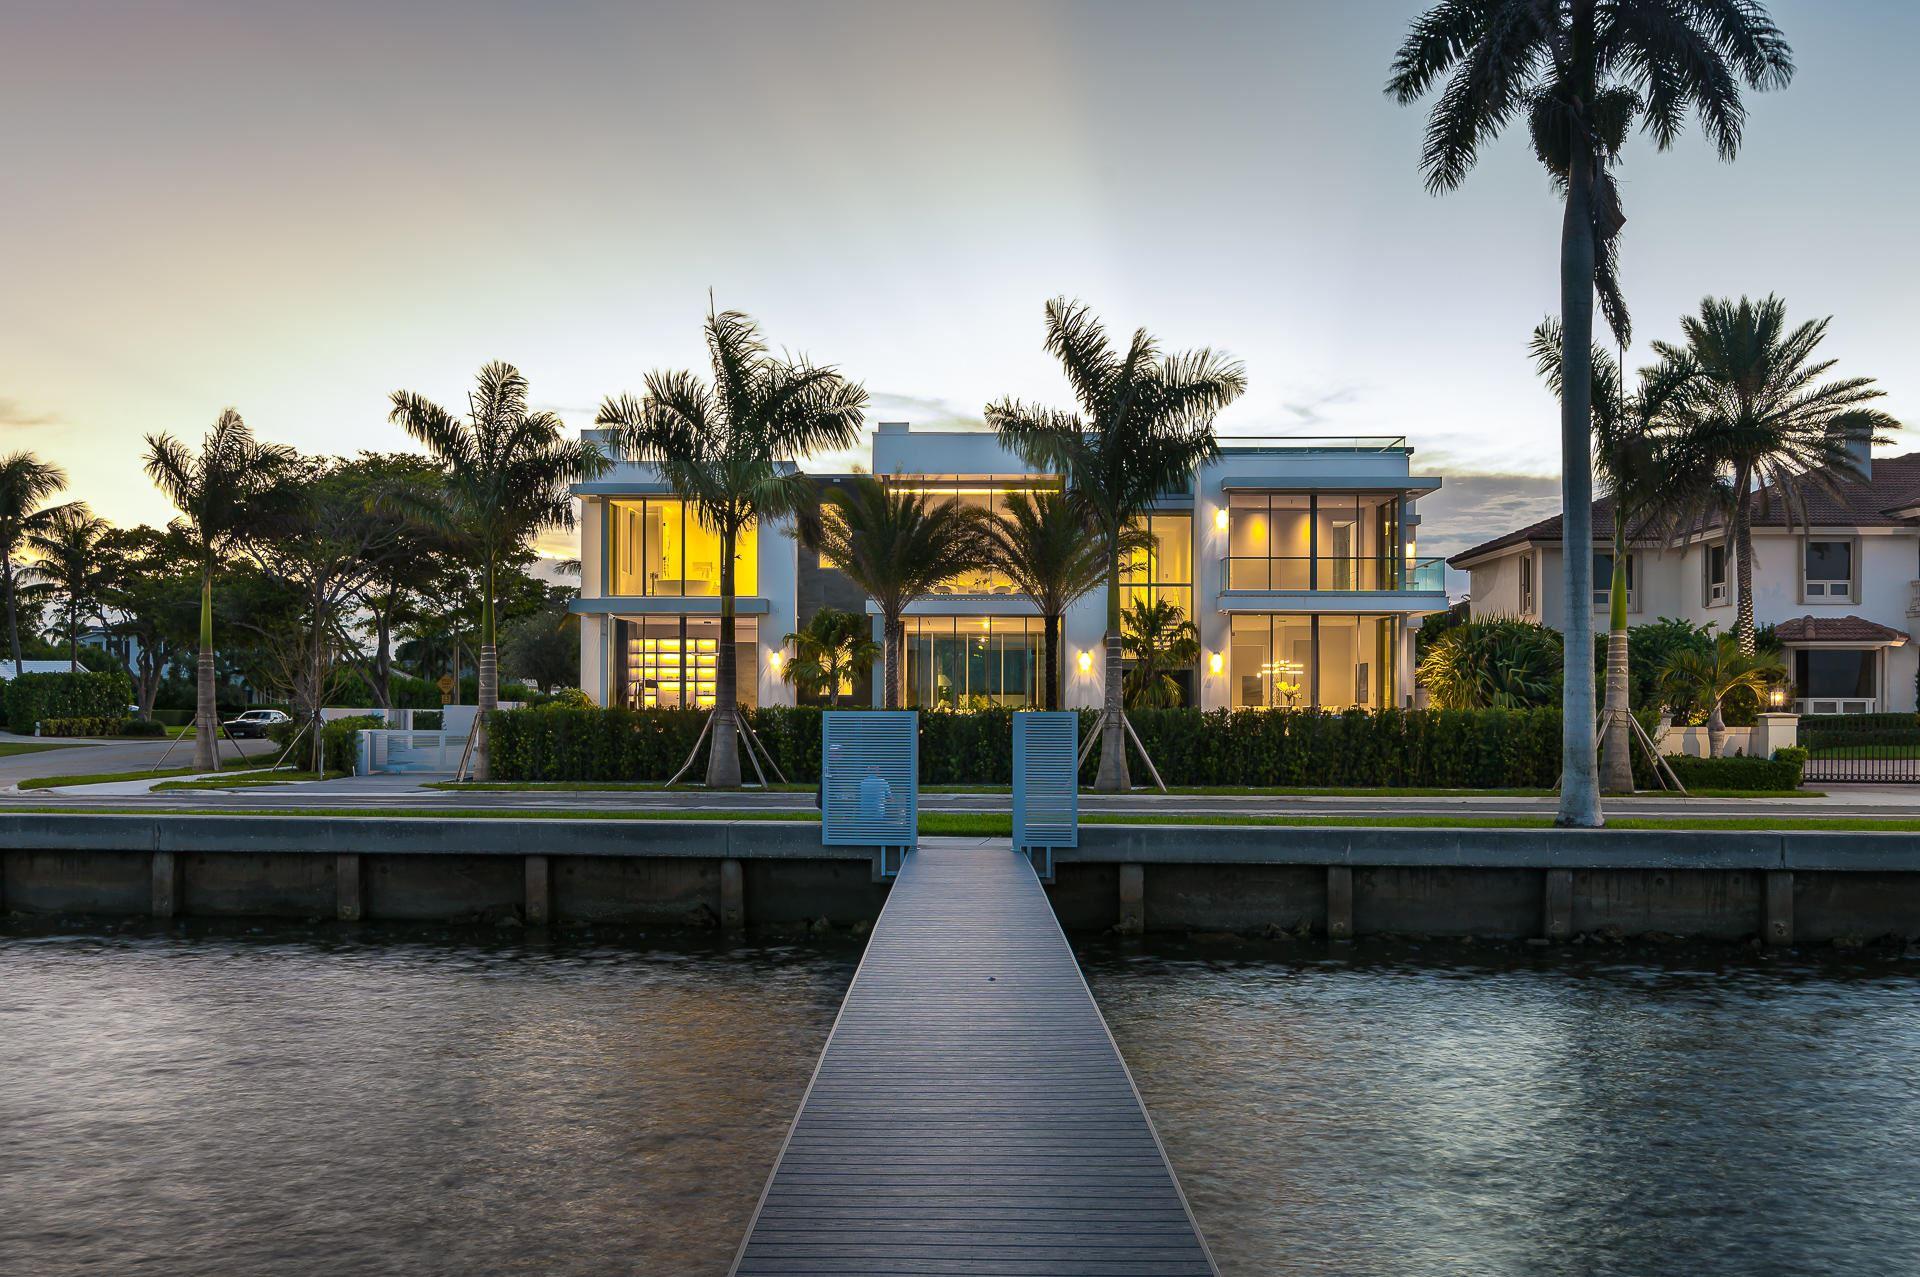 6717 S Flagler Drive, West Palm Beach, FL 33405 - MLS#: RX-10653668